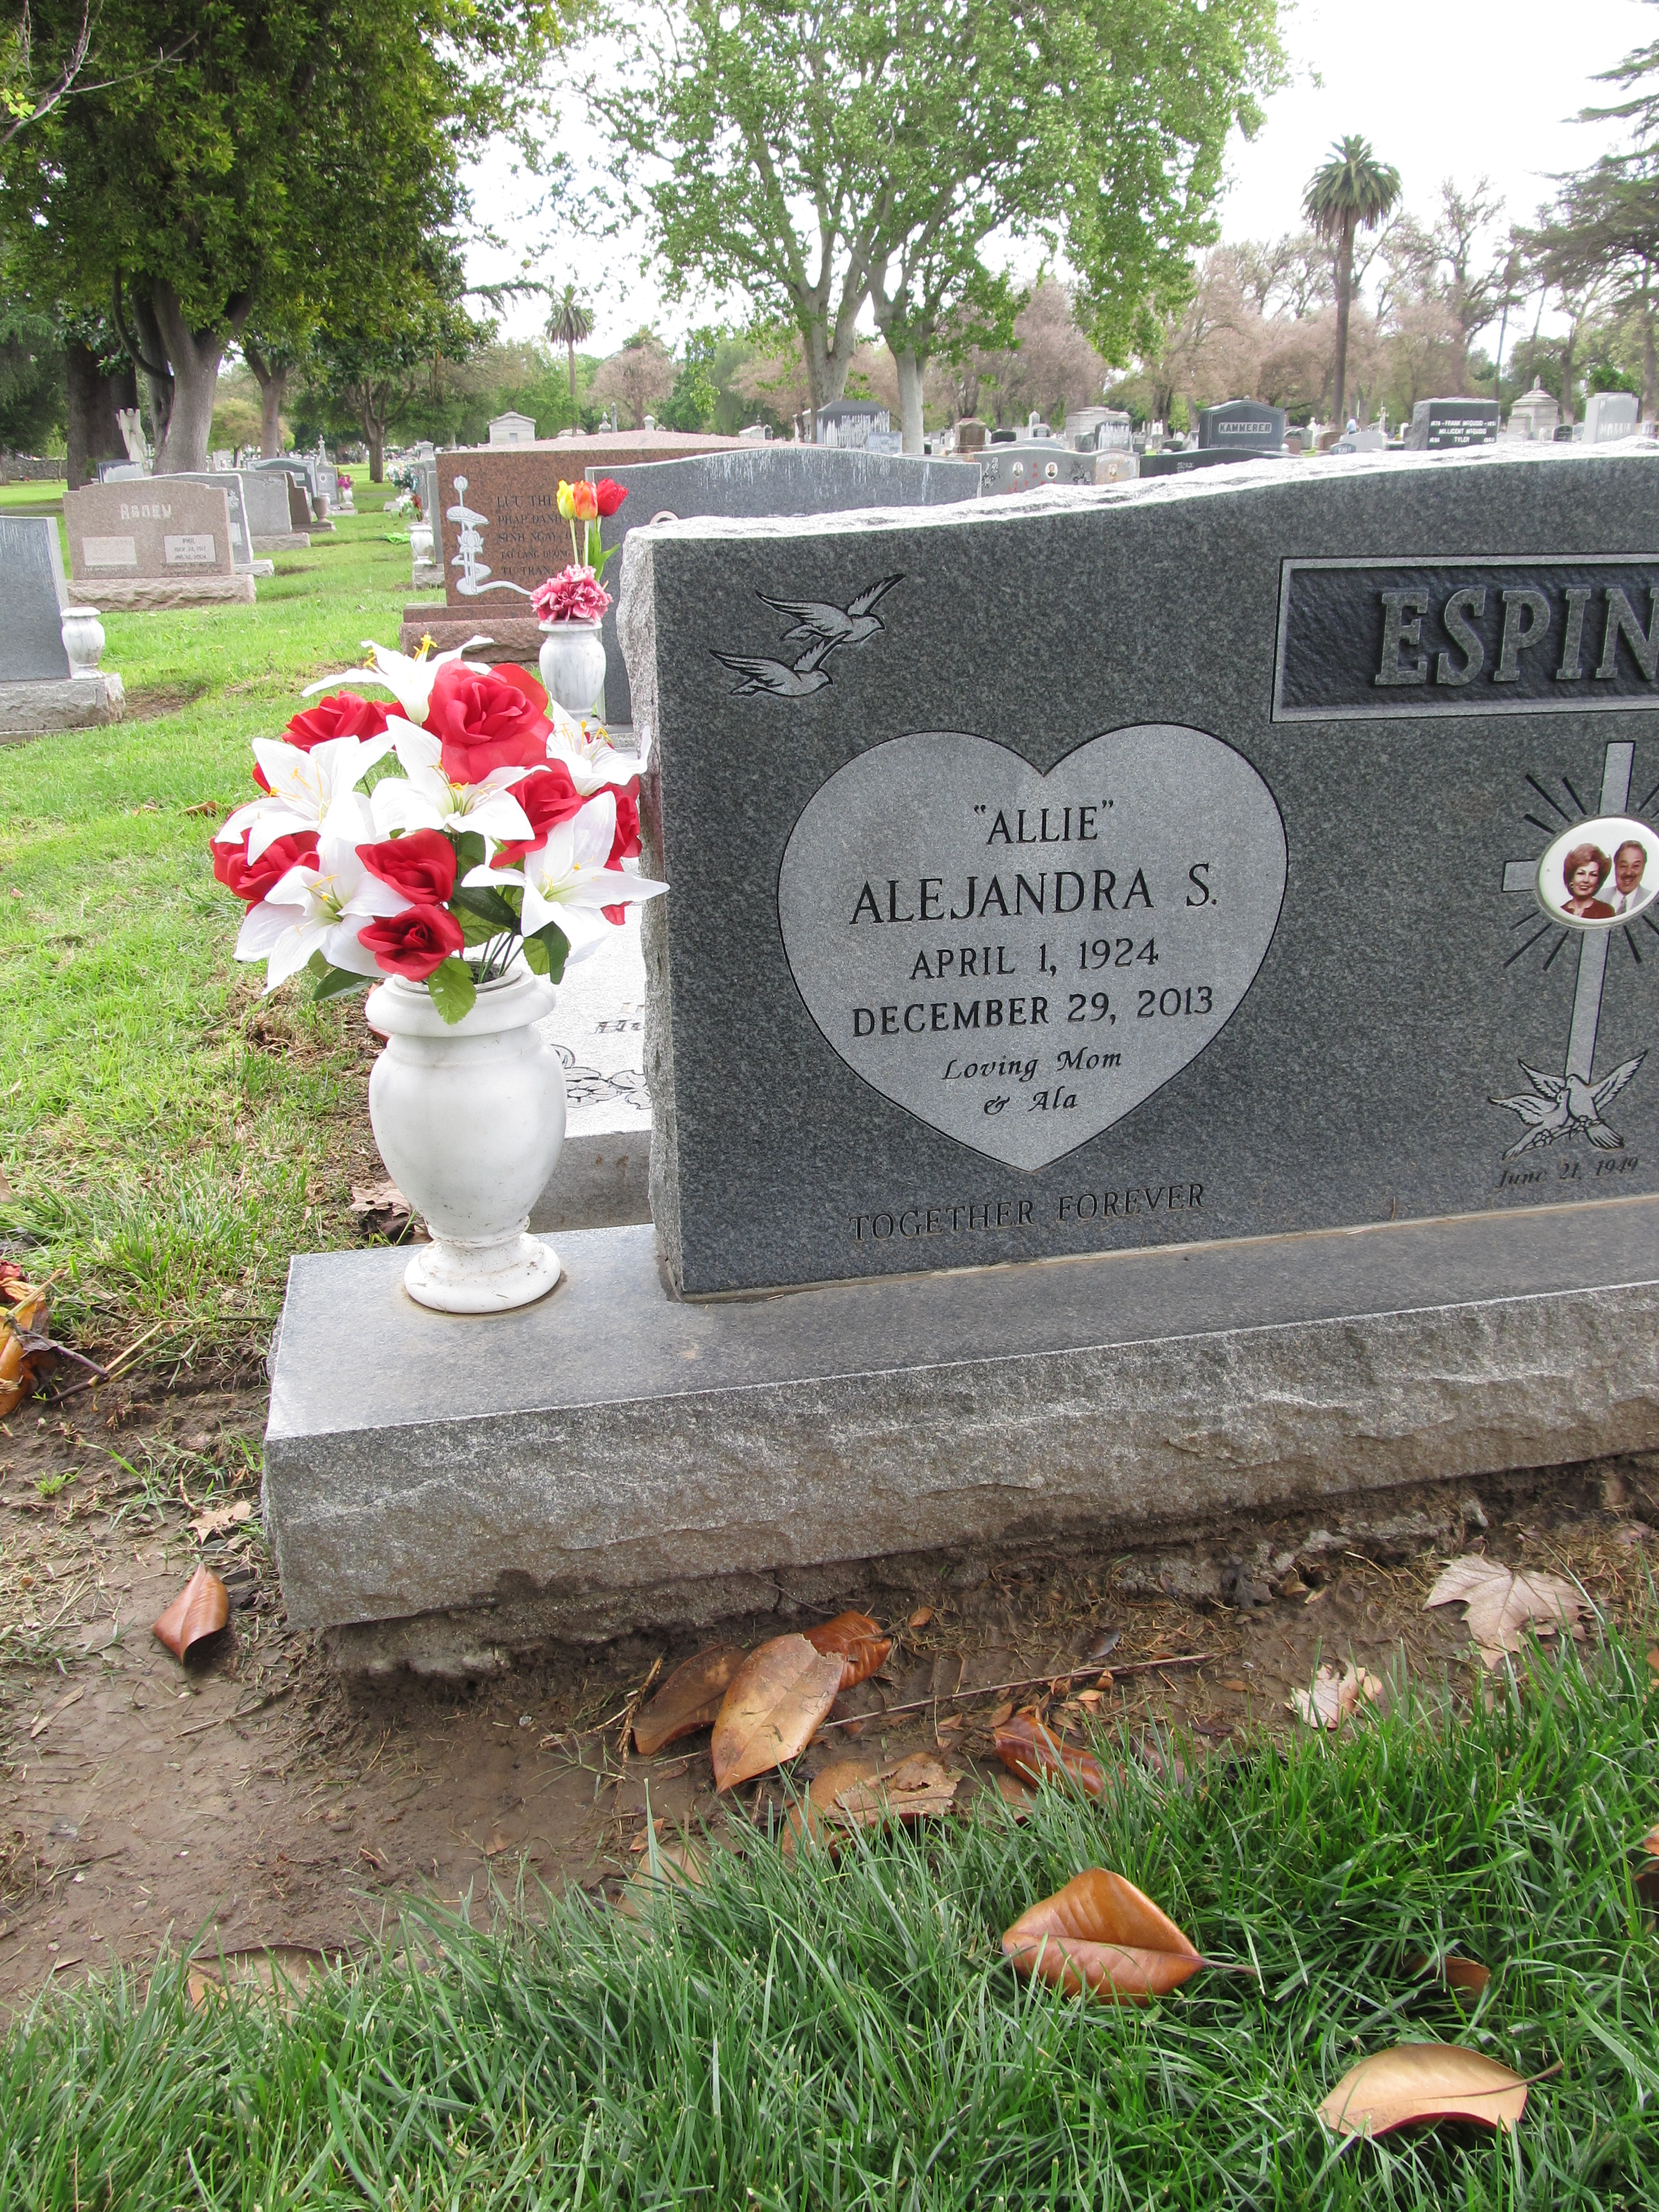 She had no chance to survive. Alejandra Rubio died